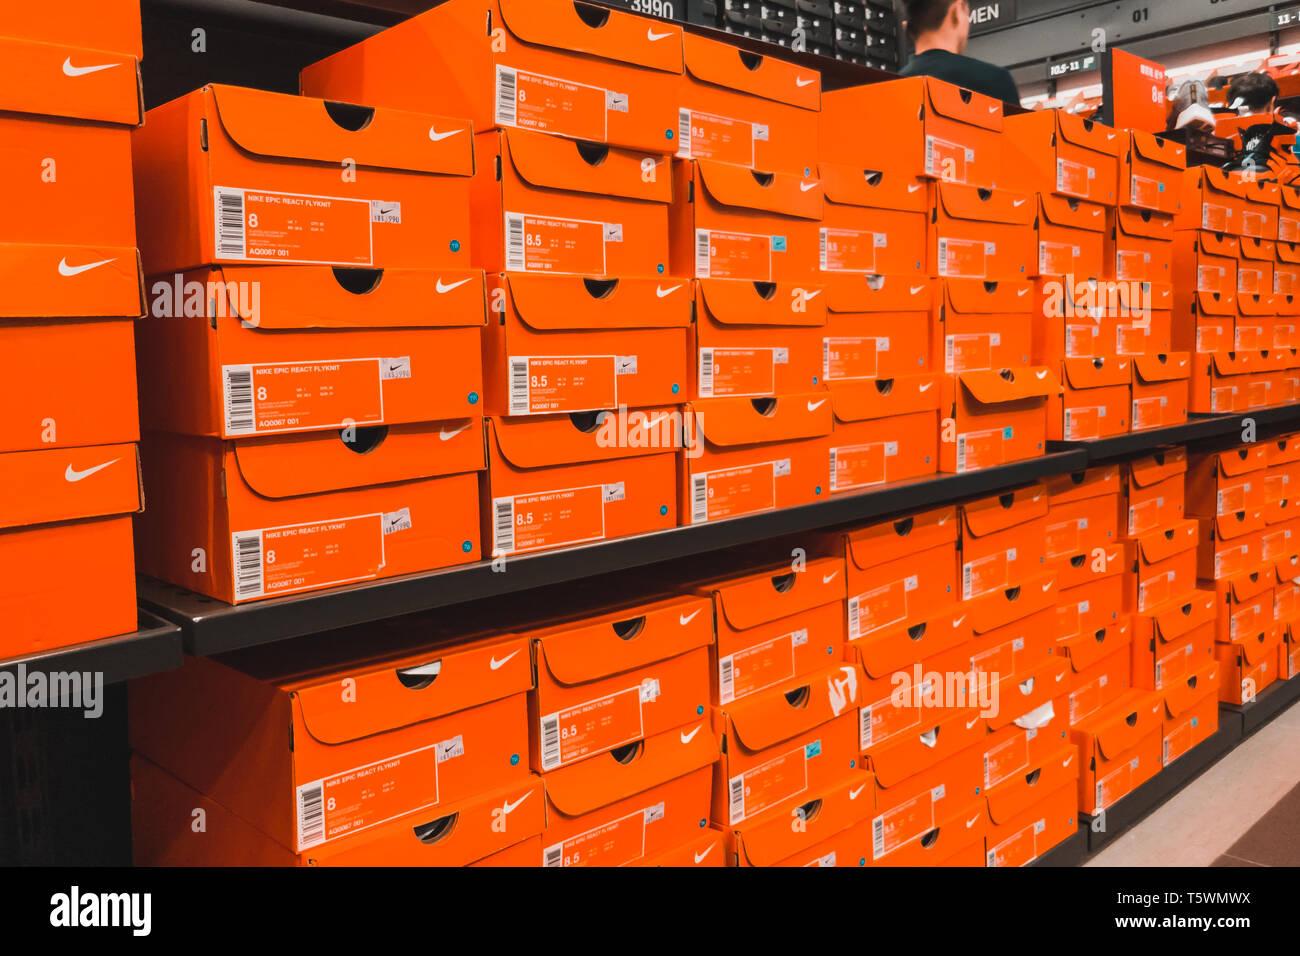 Huge stack of orange Nike Shoe boxes at